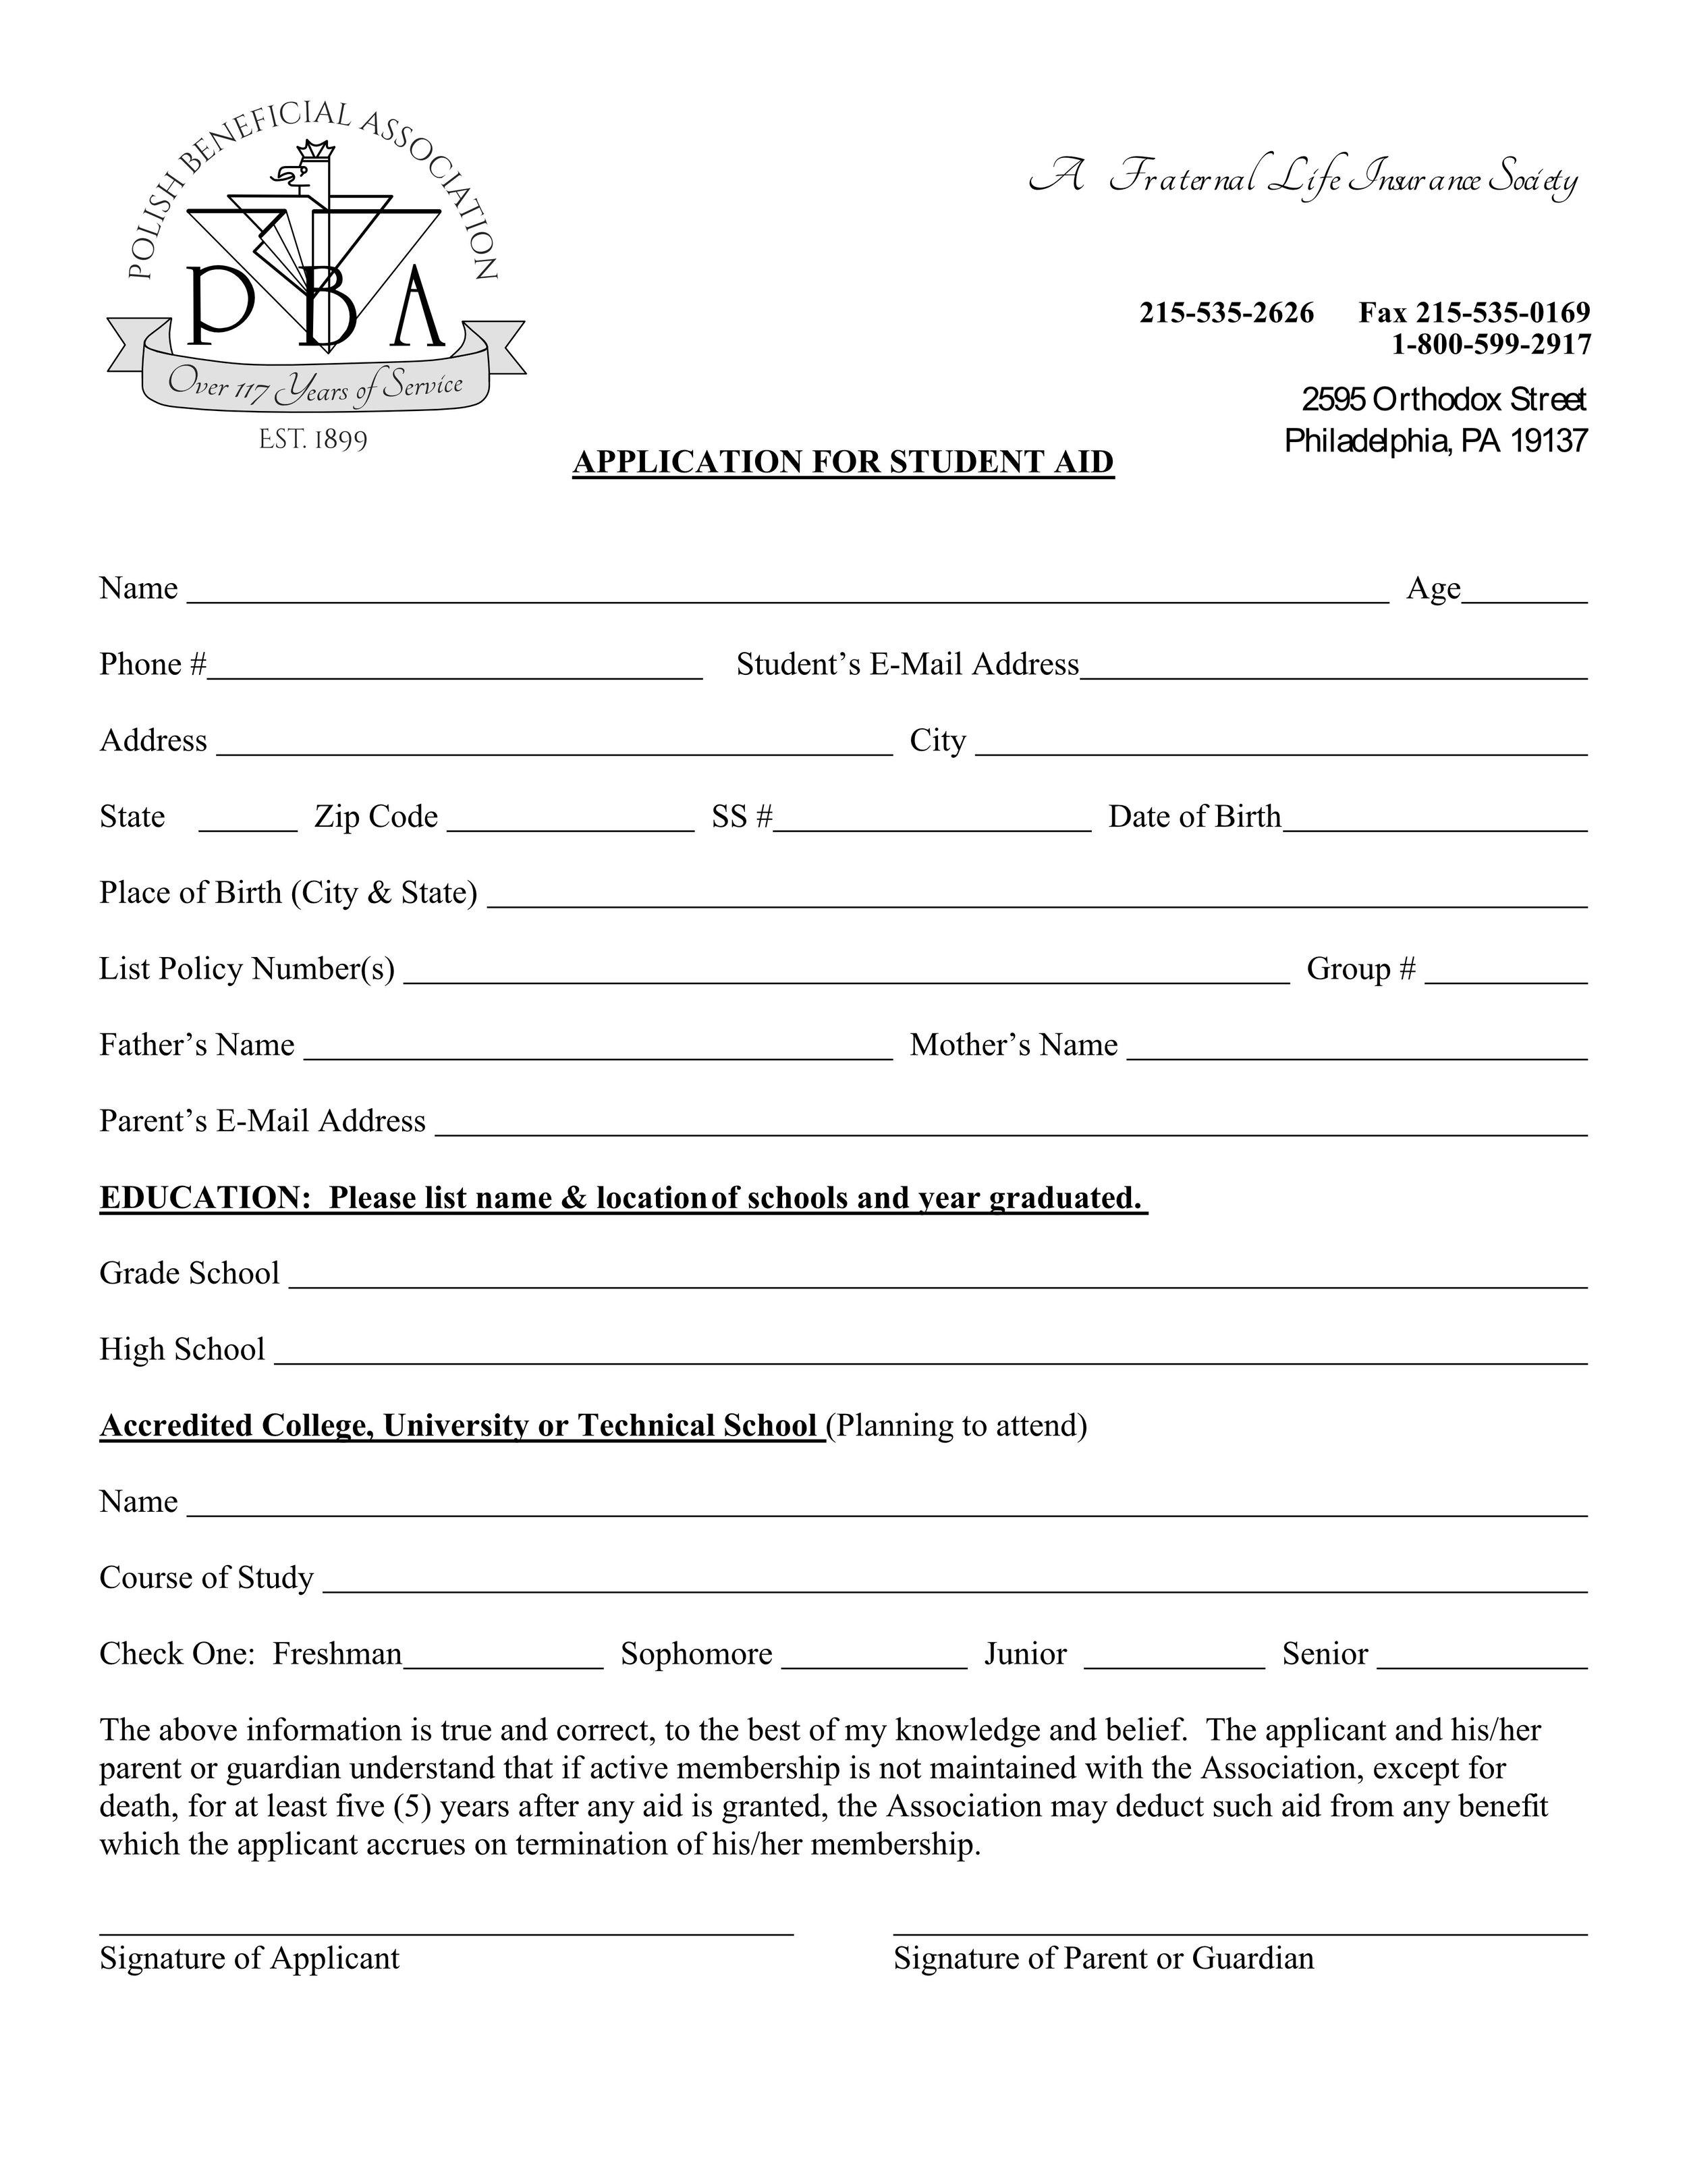 PBA_Stipend Application)_Image.jpg